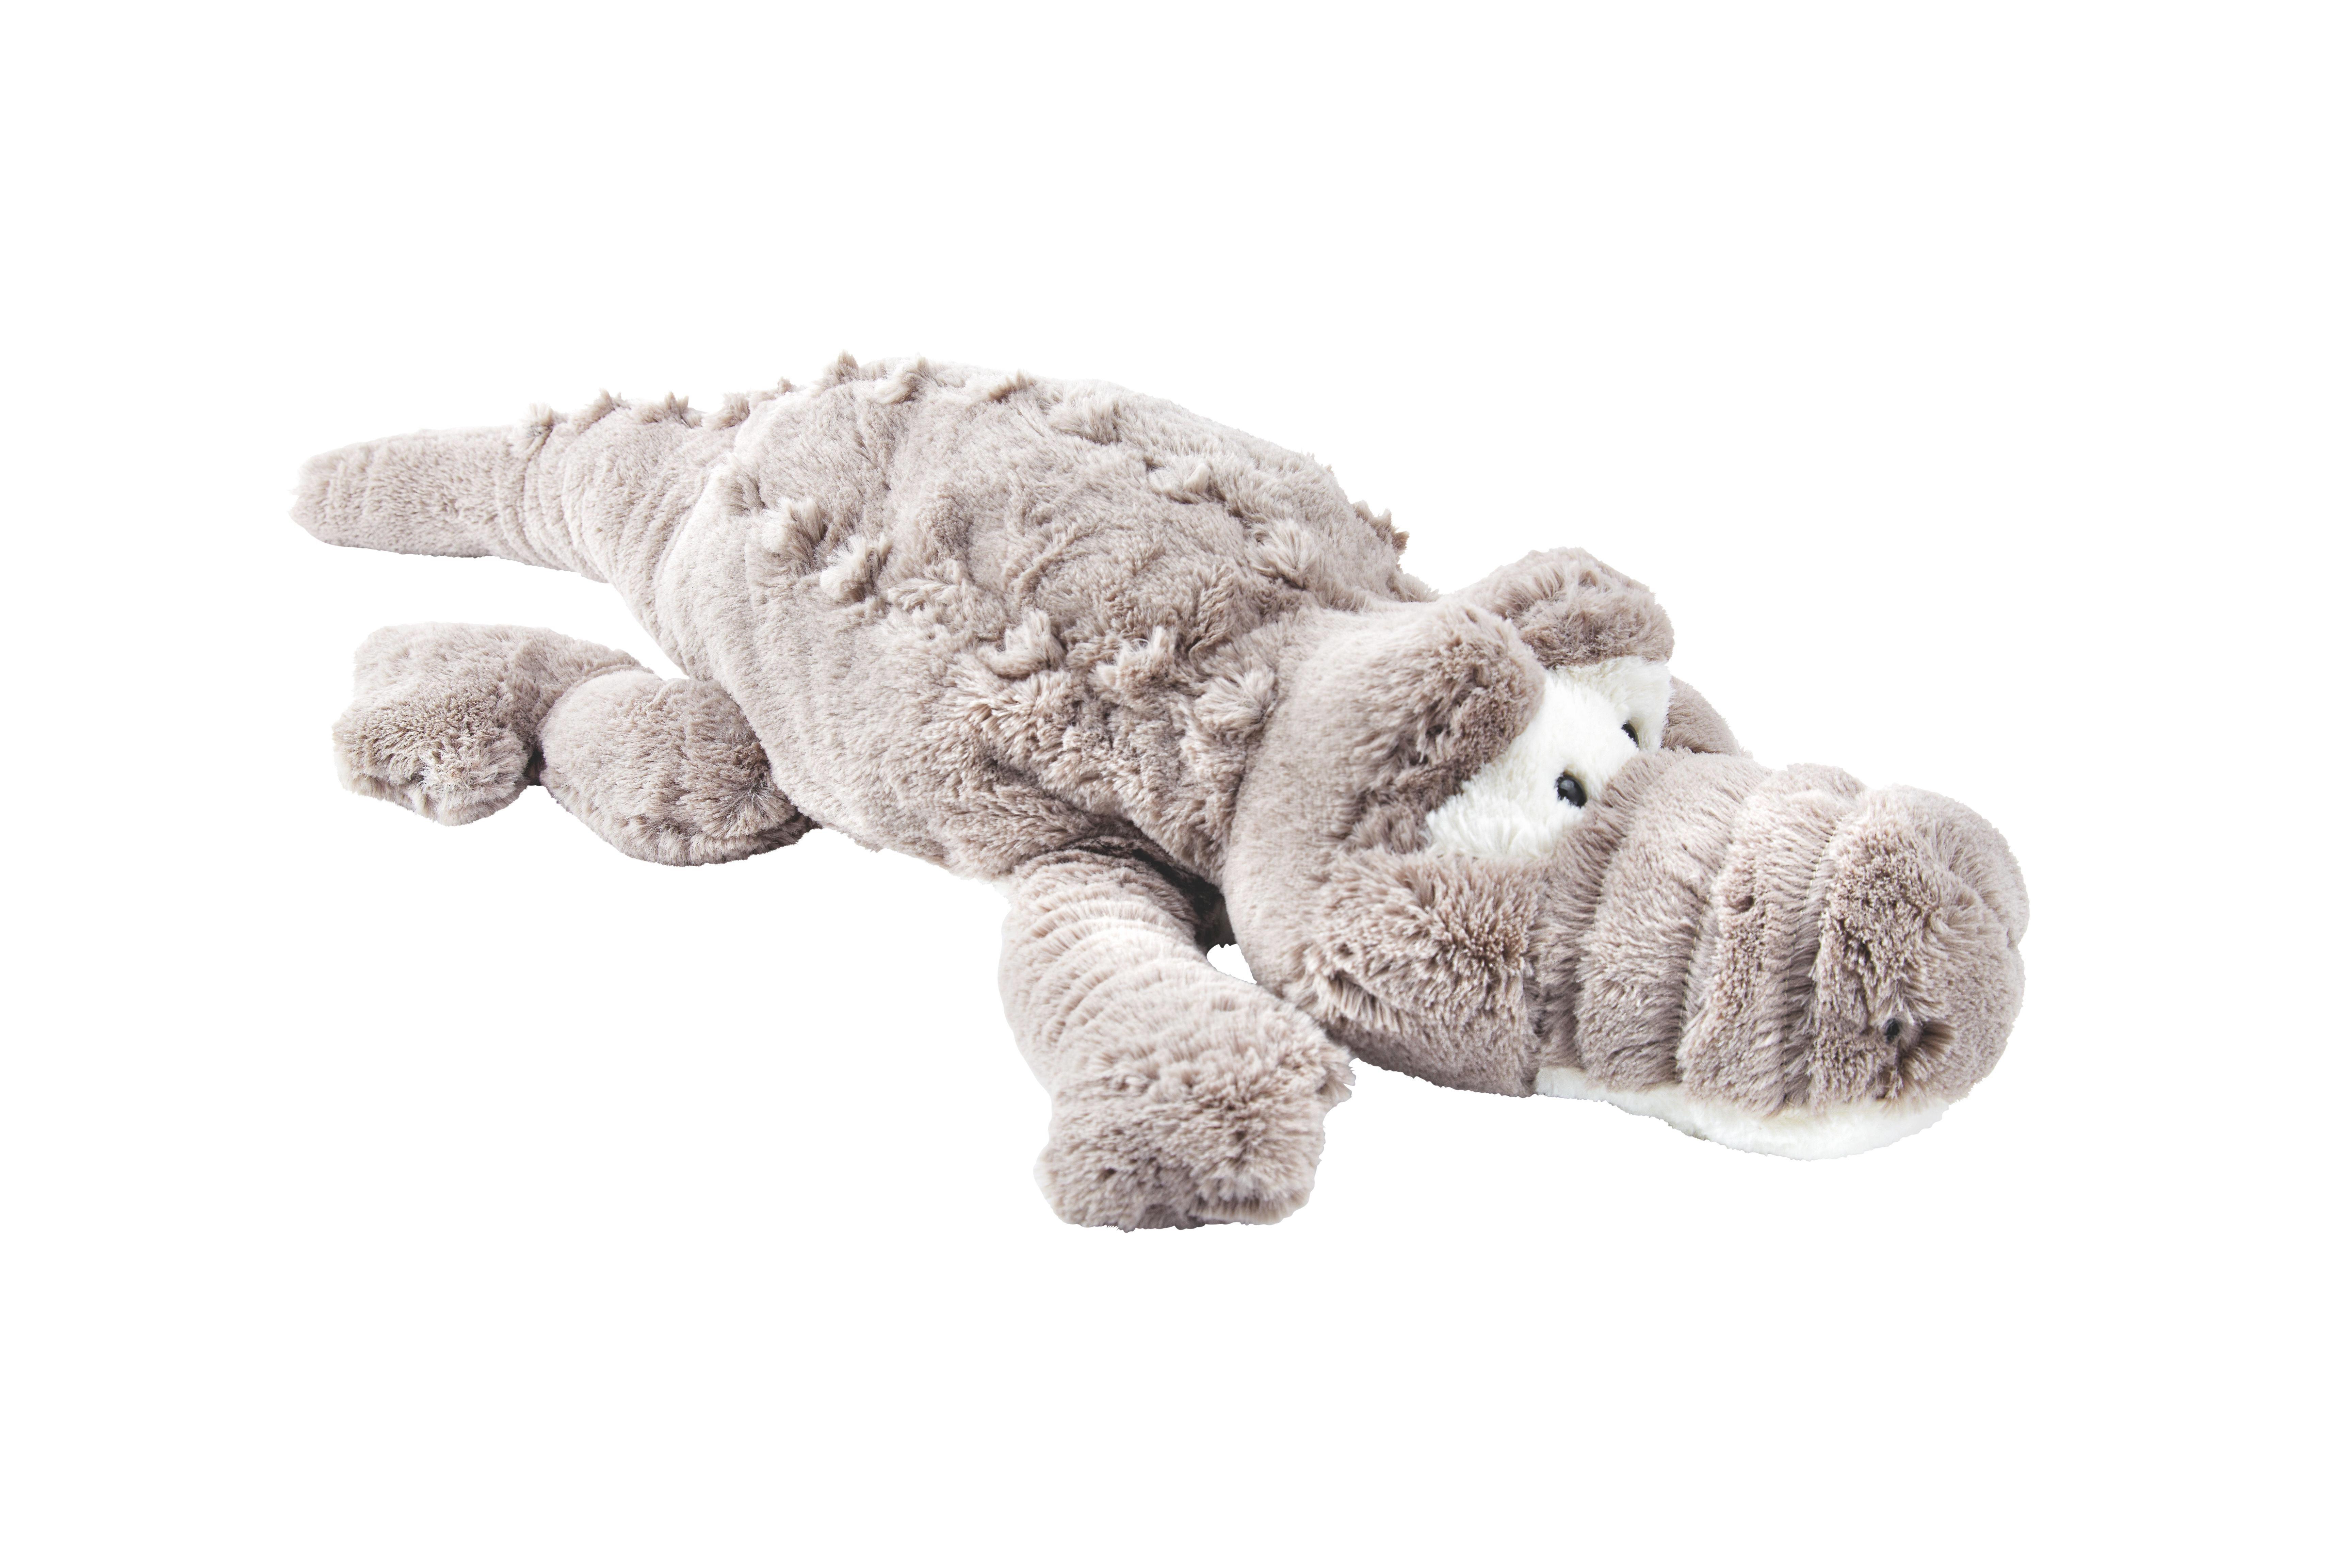 Plüschtier Krokodil in Creme/taupe - Taupe/Creme, Textil (85cm) - MÖMAX modern living